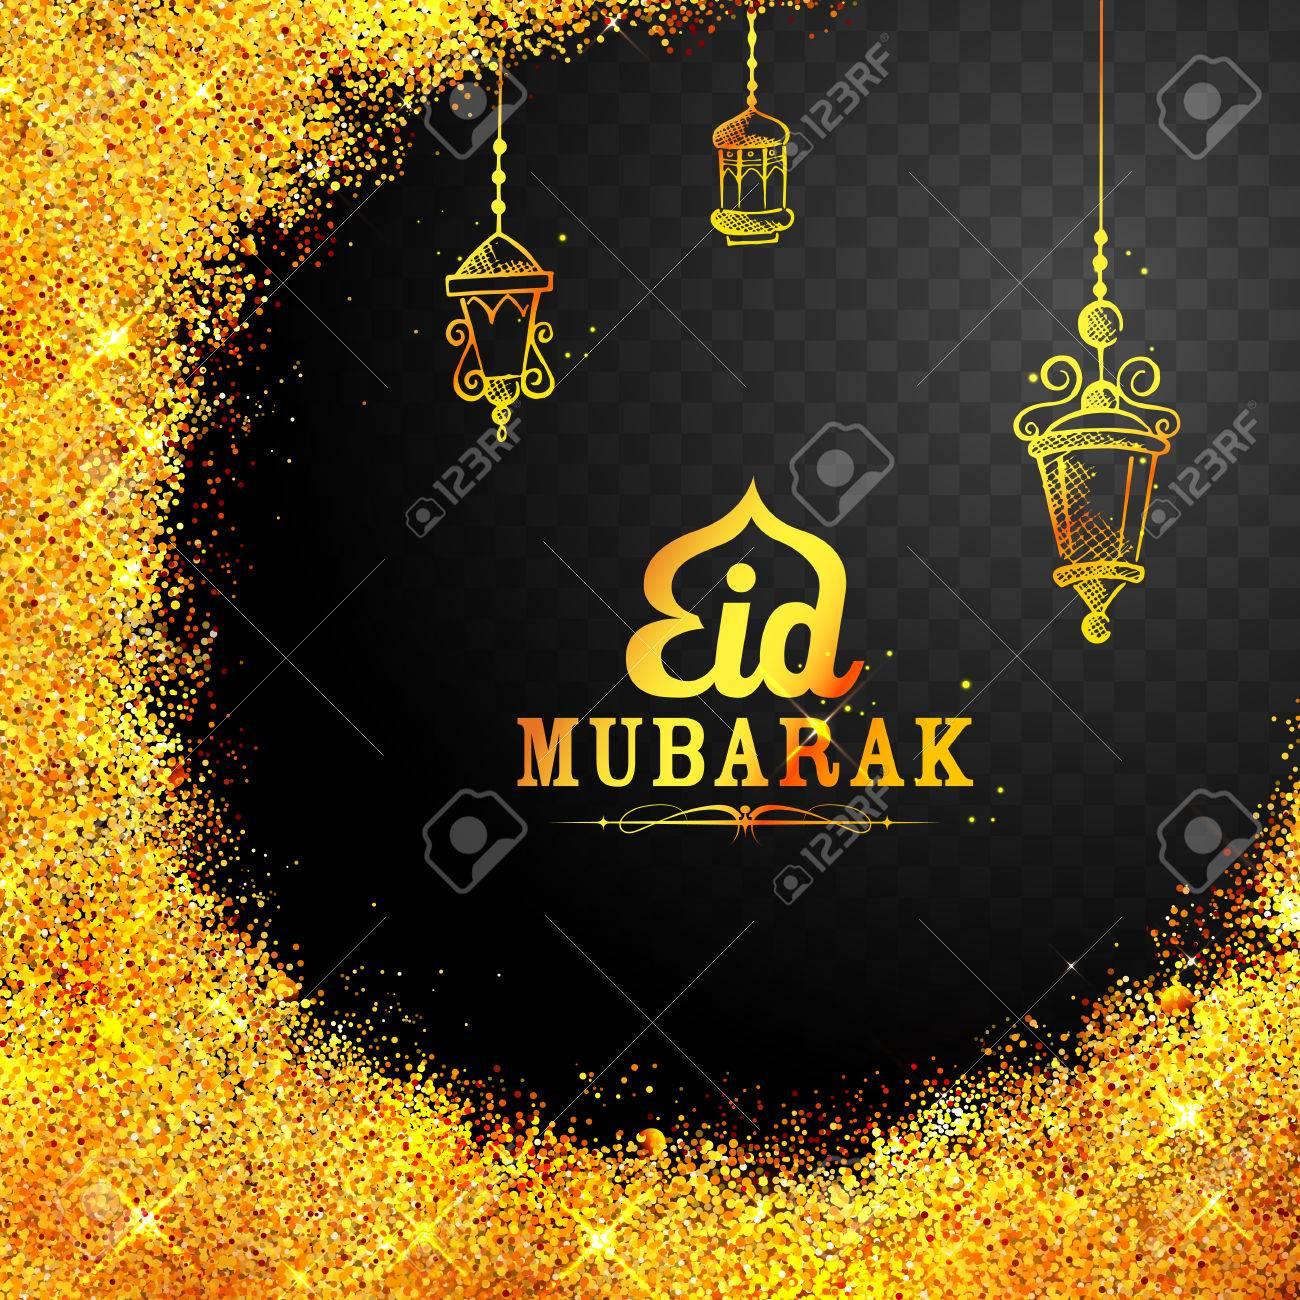 Illustration Of Ramadan Kareem Generous Ramadan Greetings For